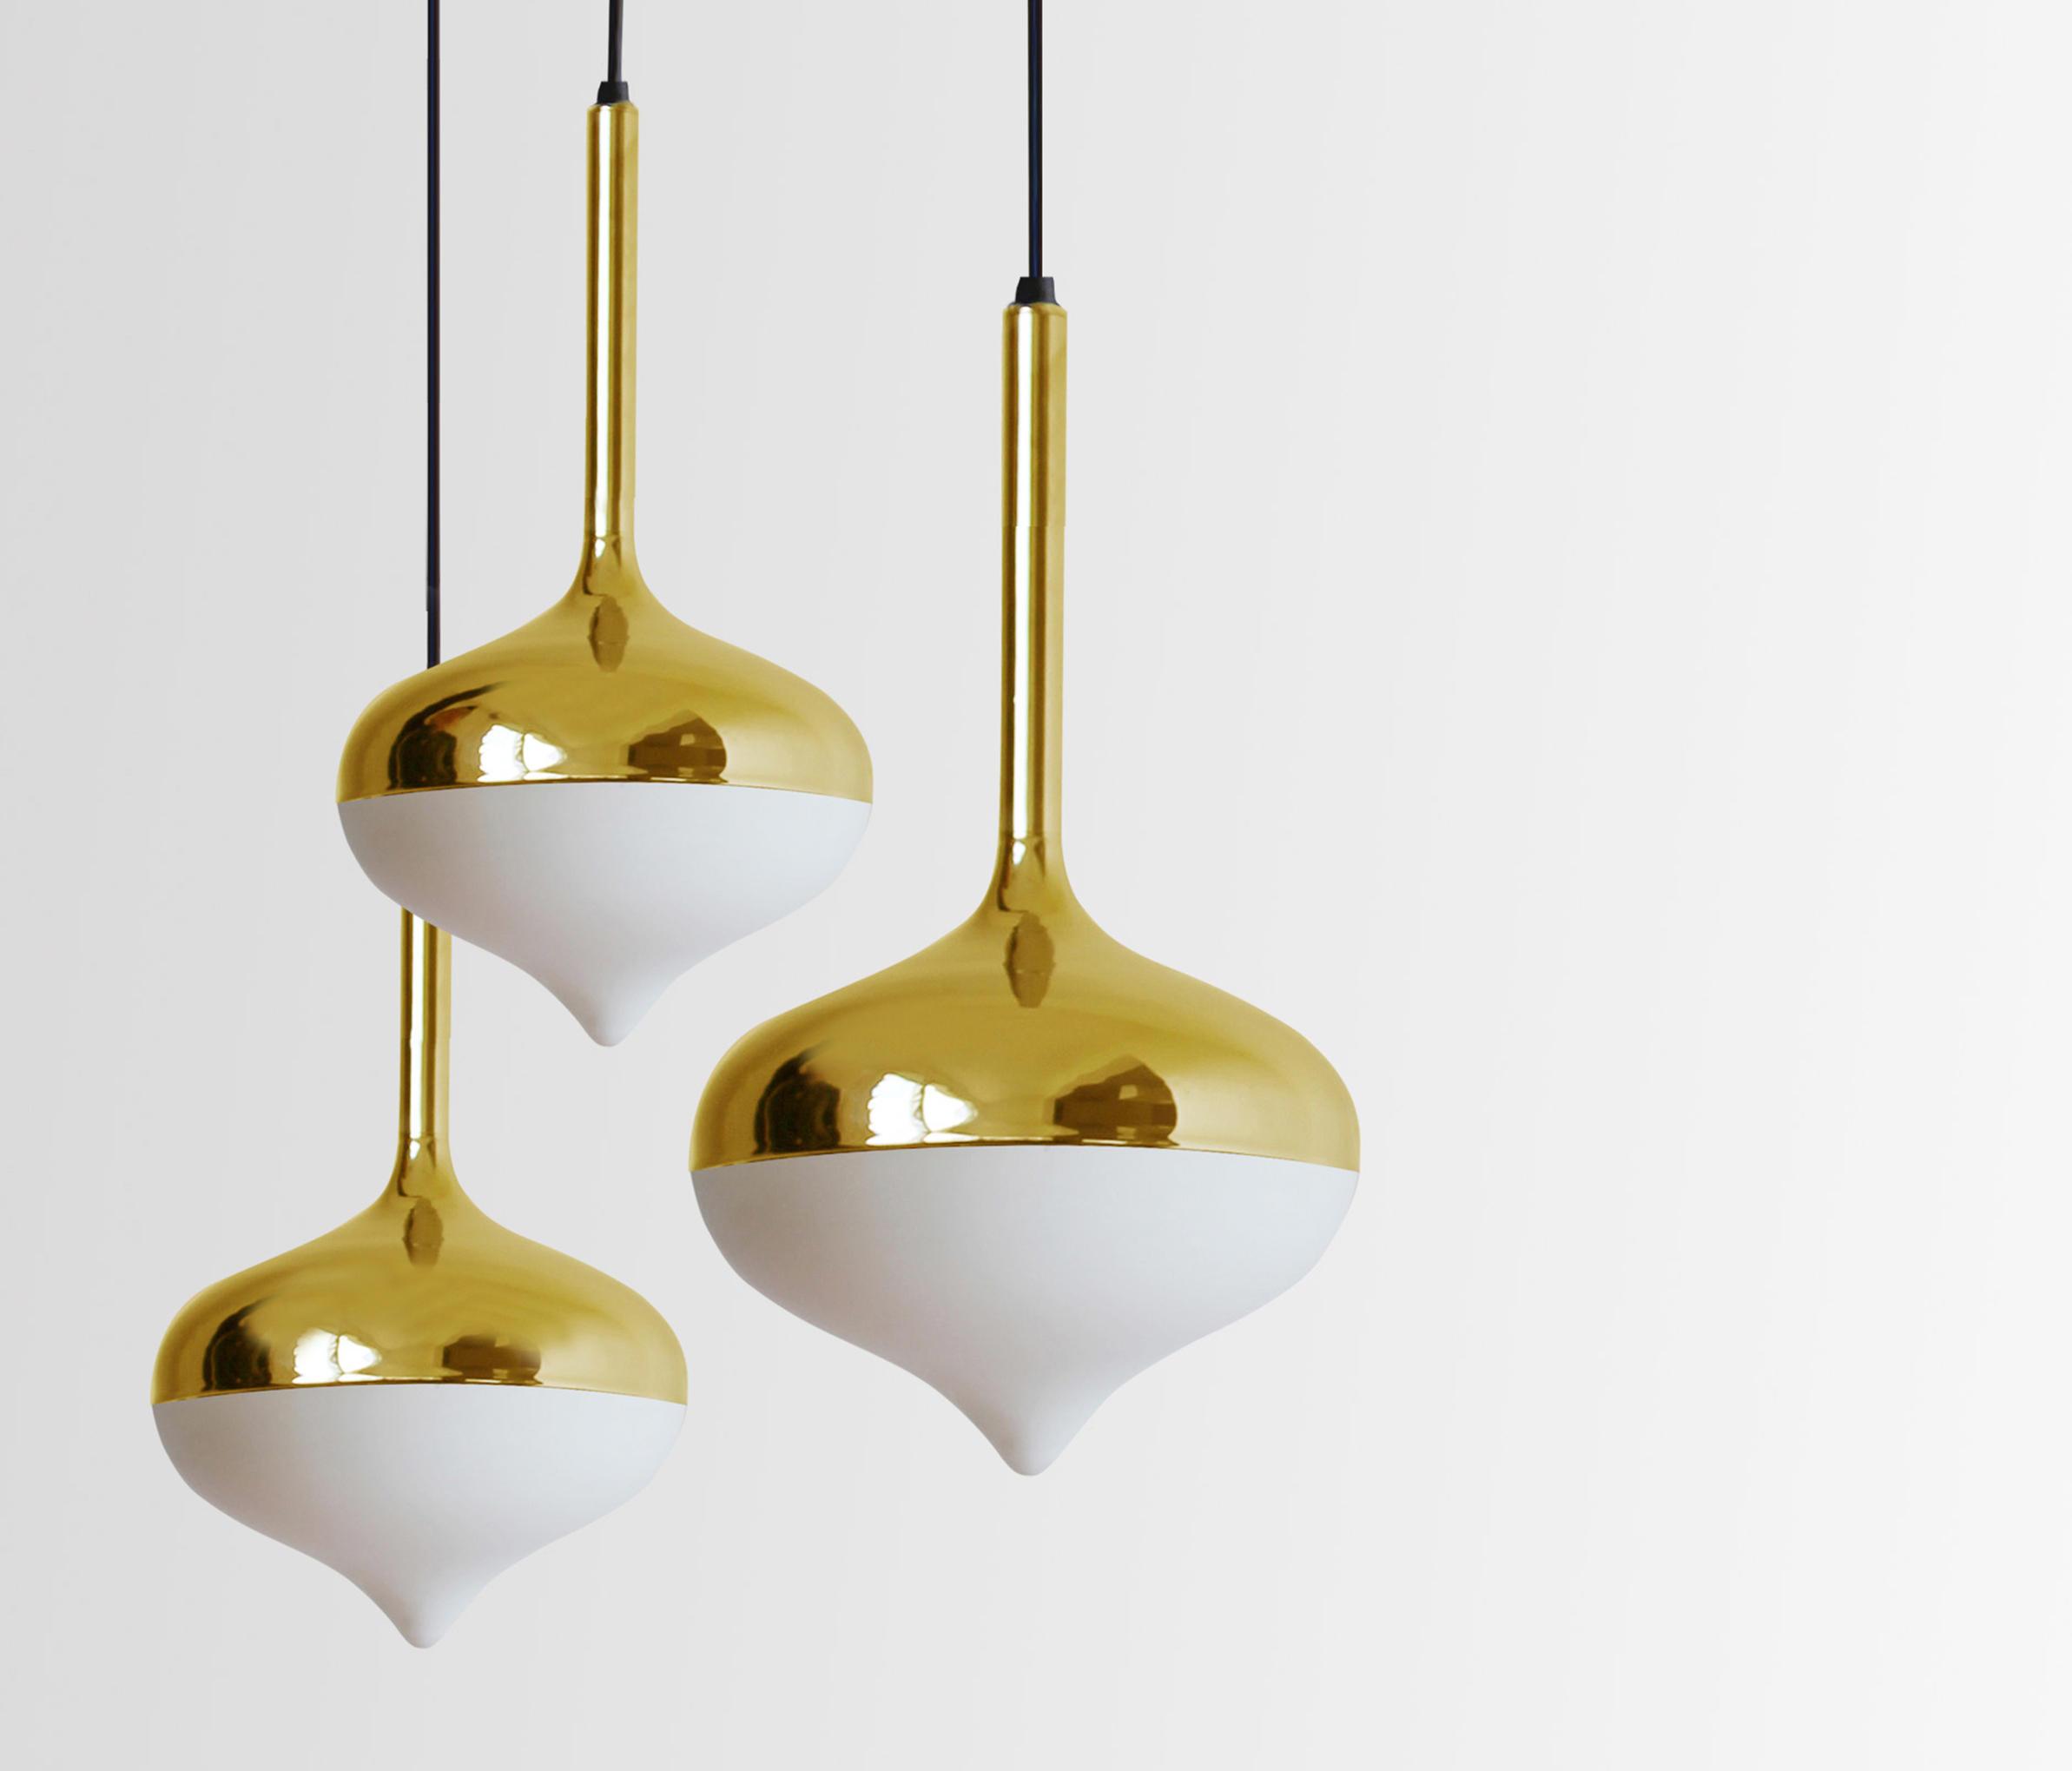 Spun Large Floor Lamp Silver General Lighting From Evie